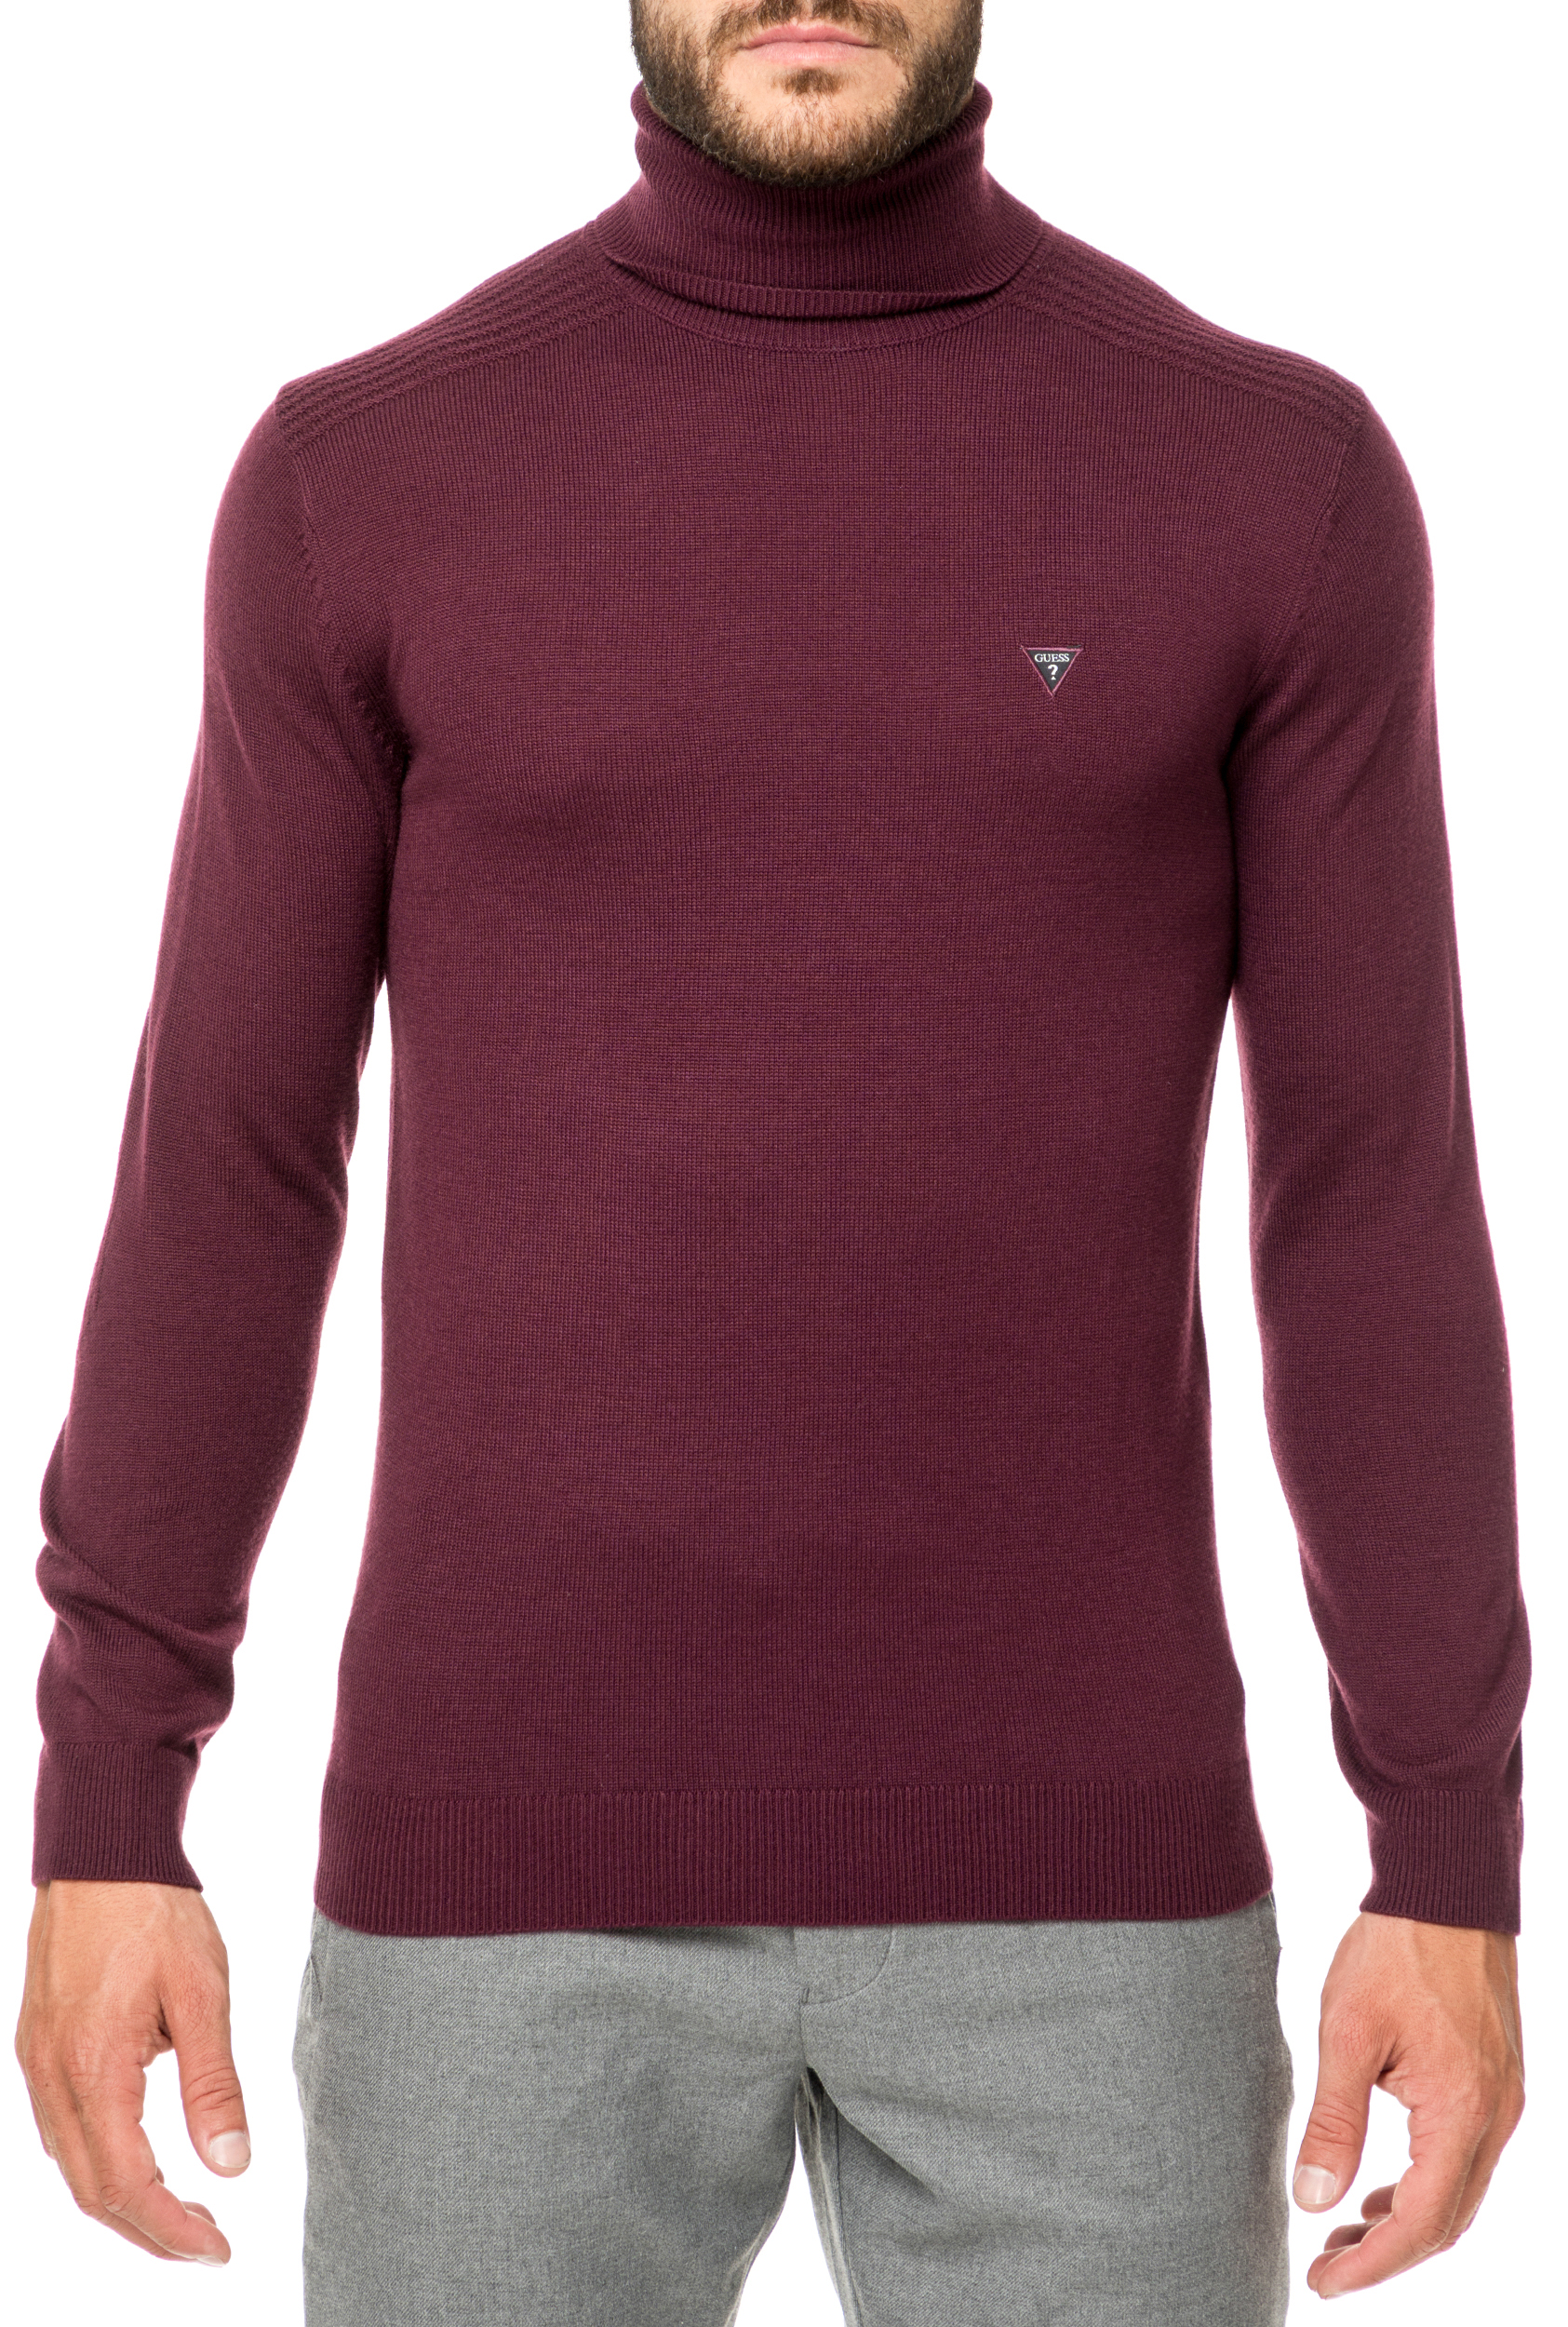 6399fd9d90c7 GUESS - Ανδρική ζιβάγκο μπλούζα GUESS μπορντό